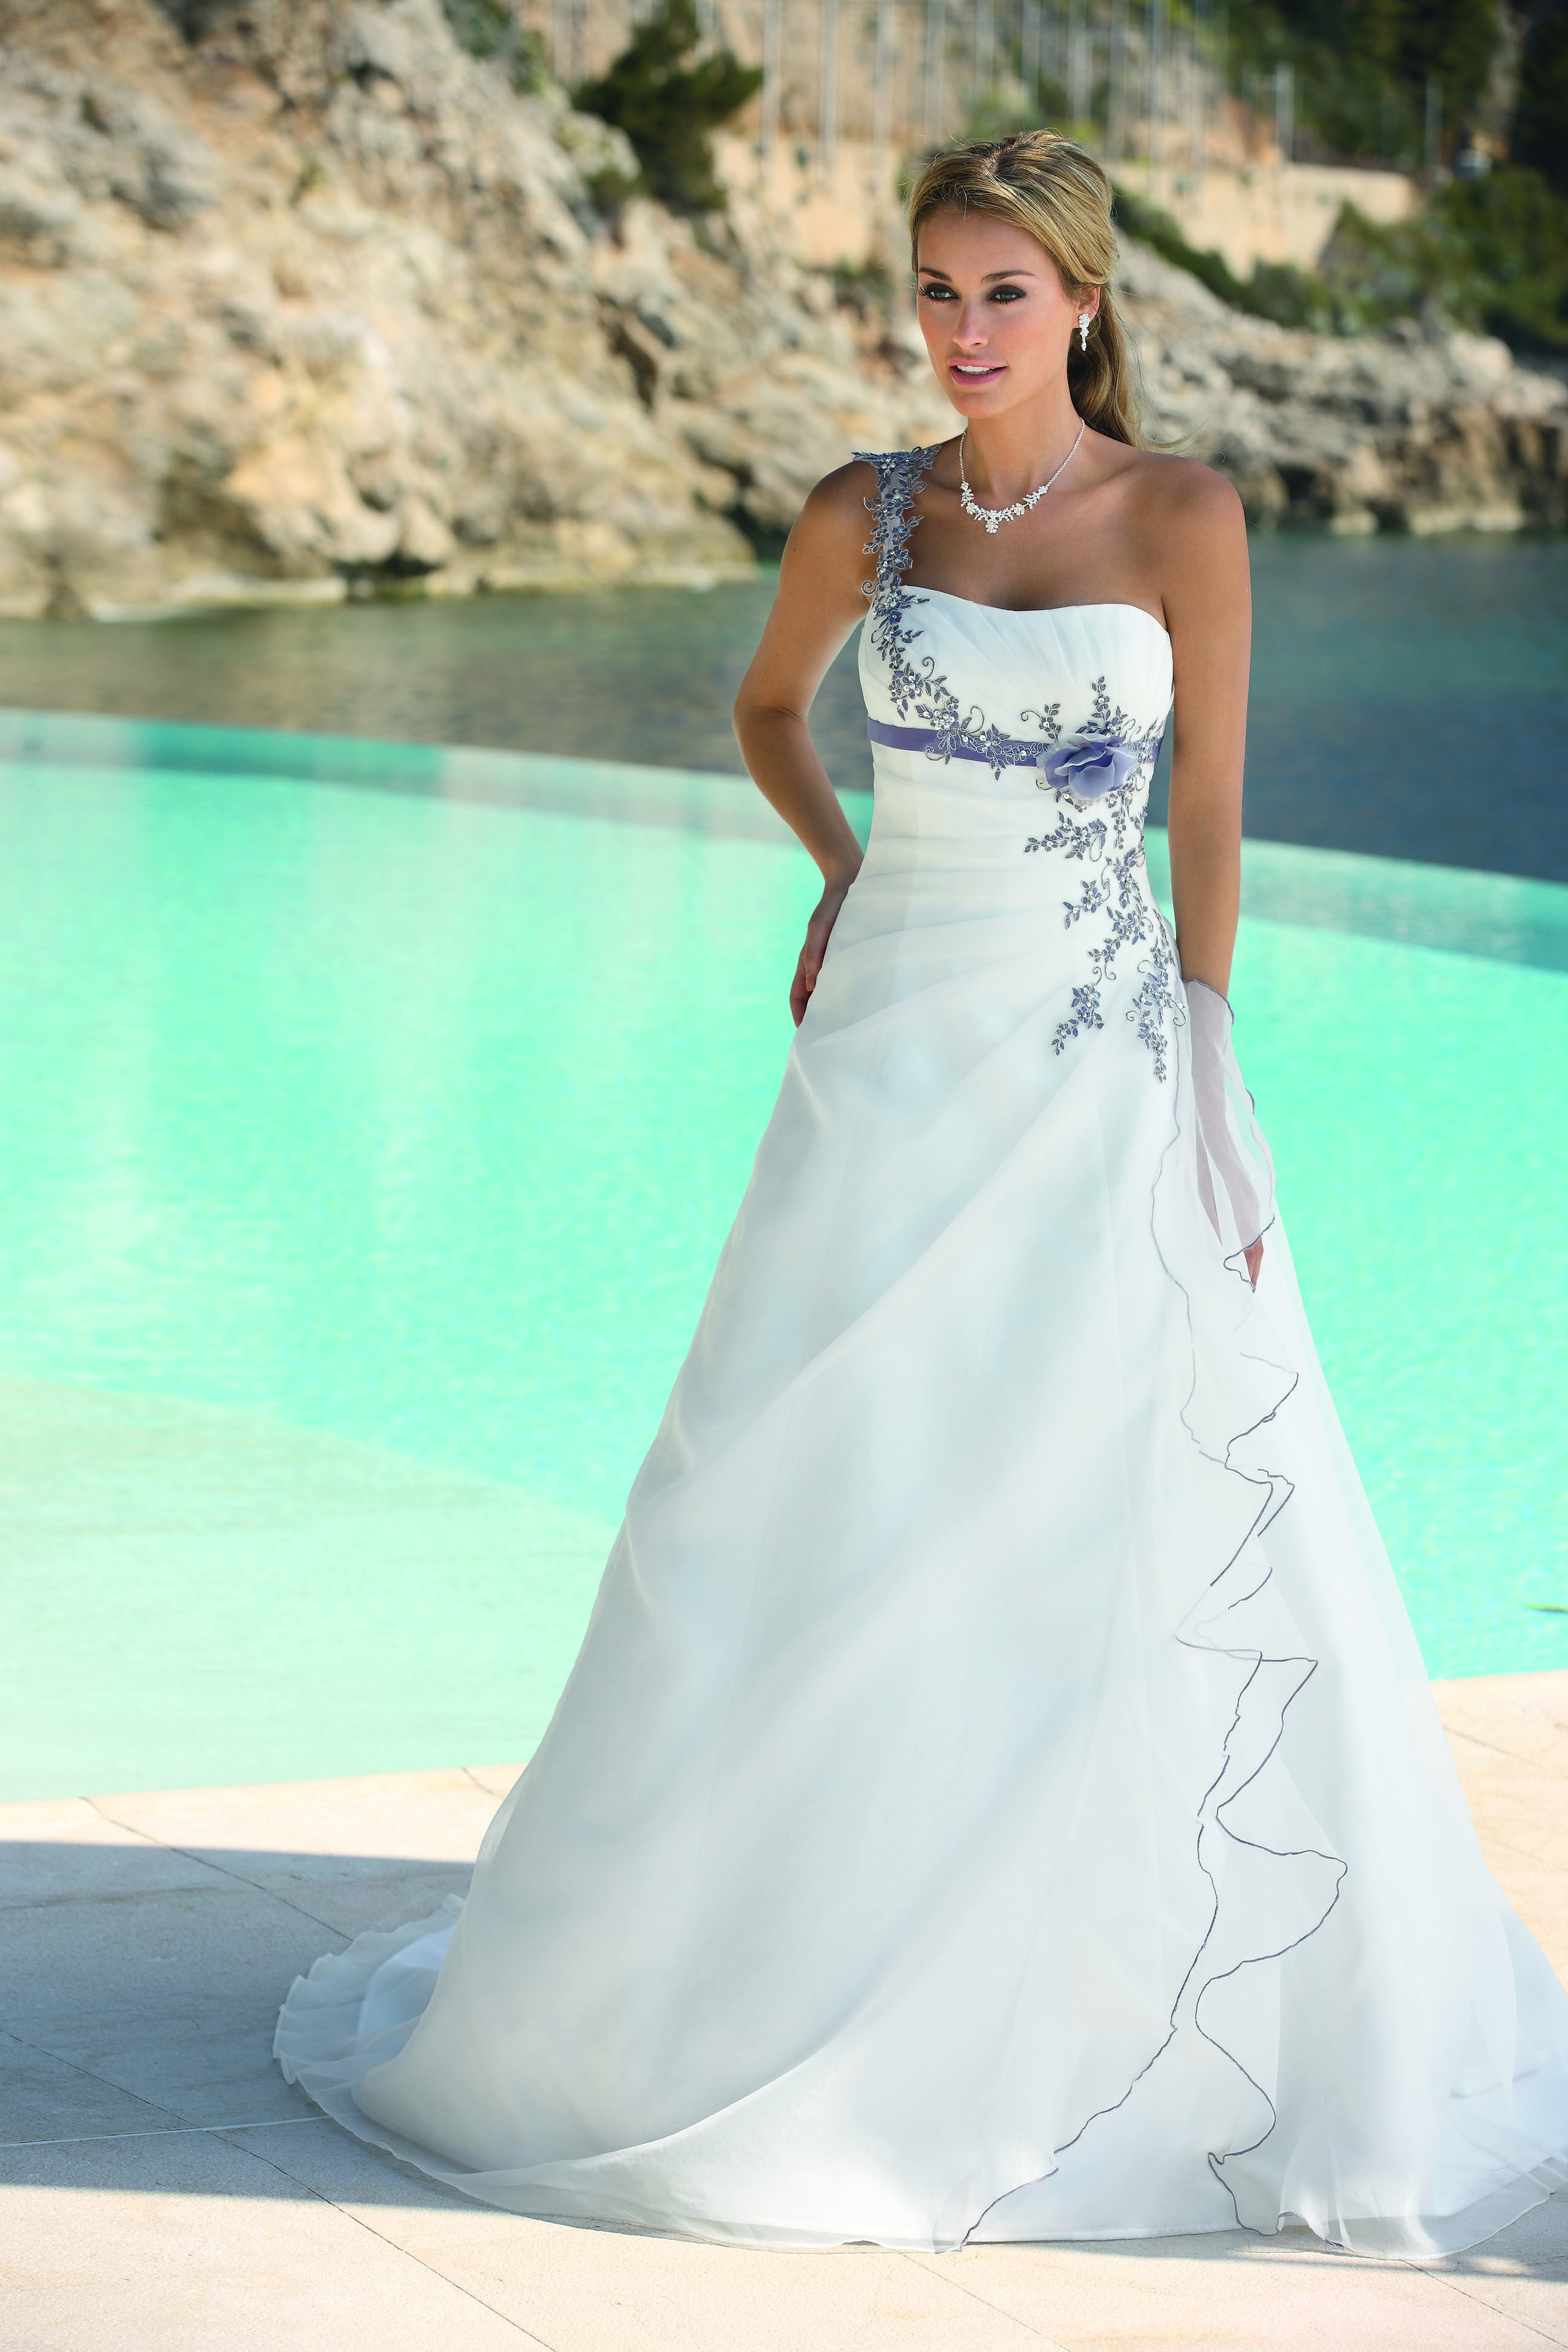 Ladybird Wedding Dress Style 33046 Ivory-Dark Purple-Silver | Closet ...